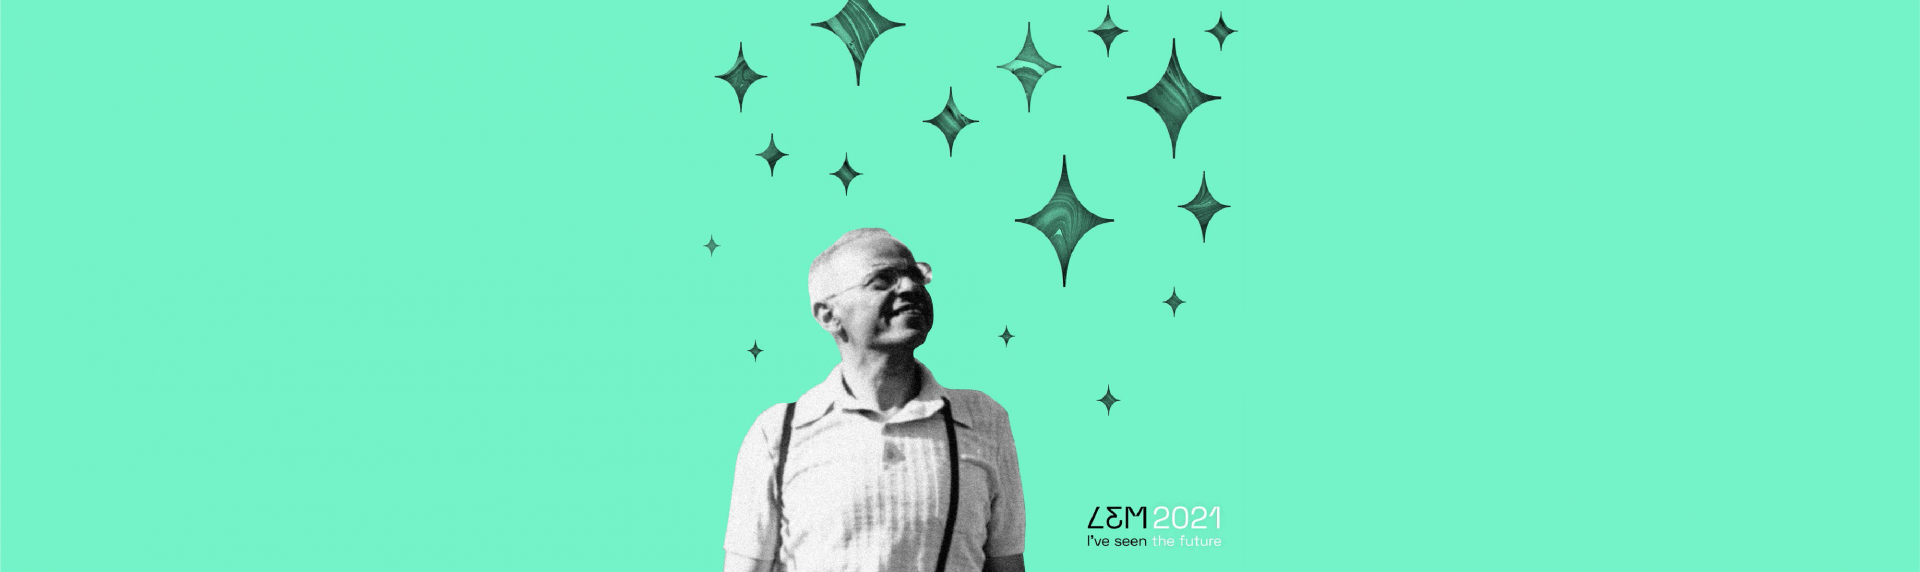 LEM 2021: I Saw the Future